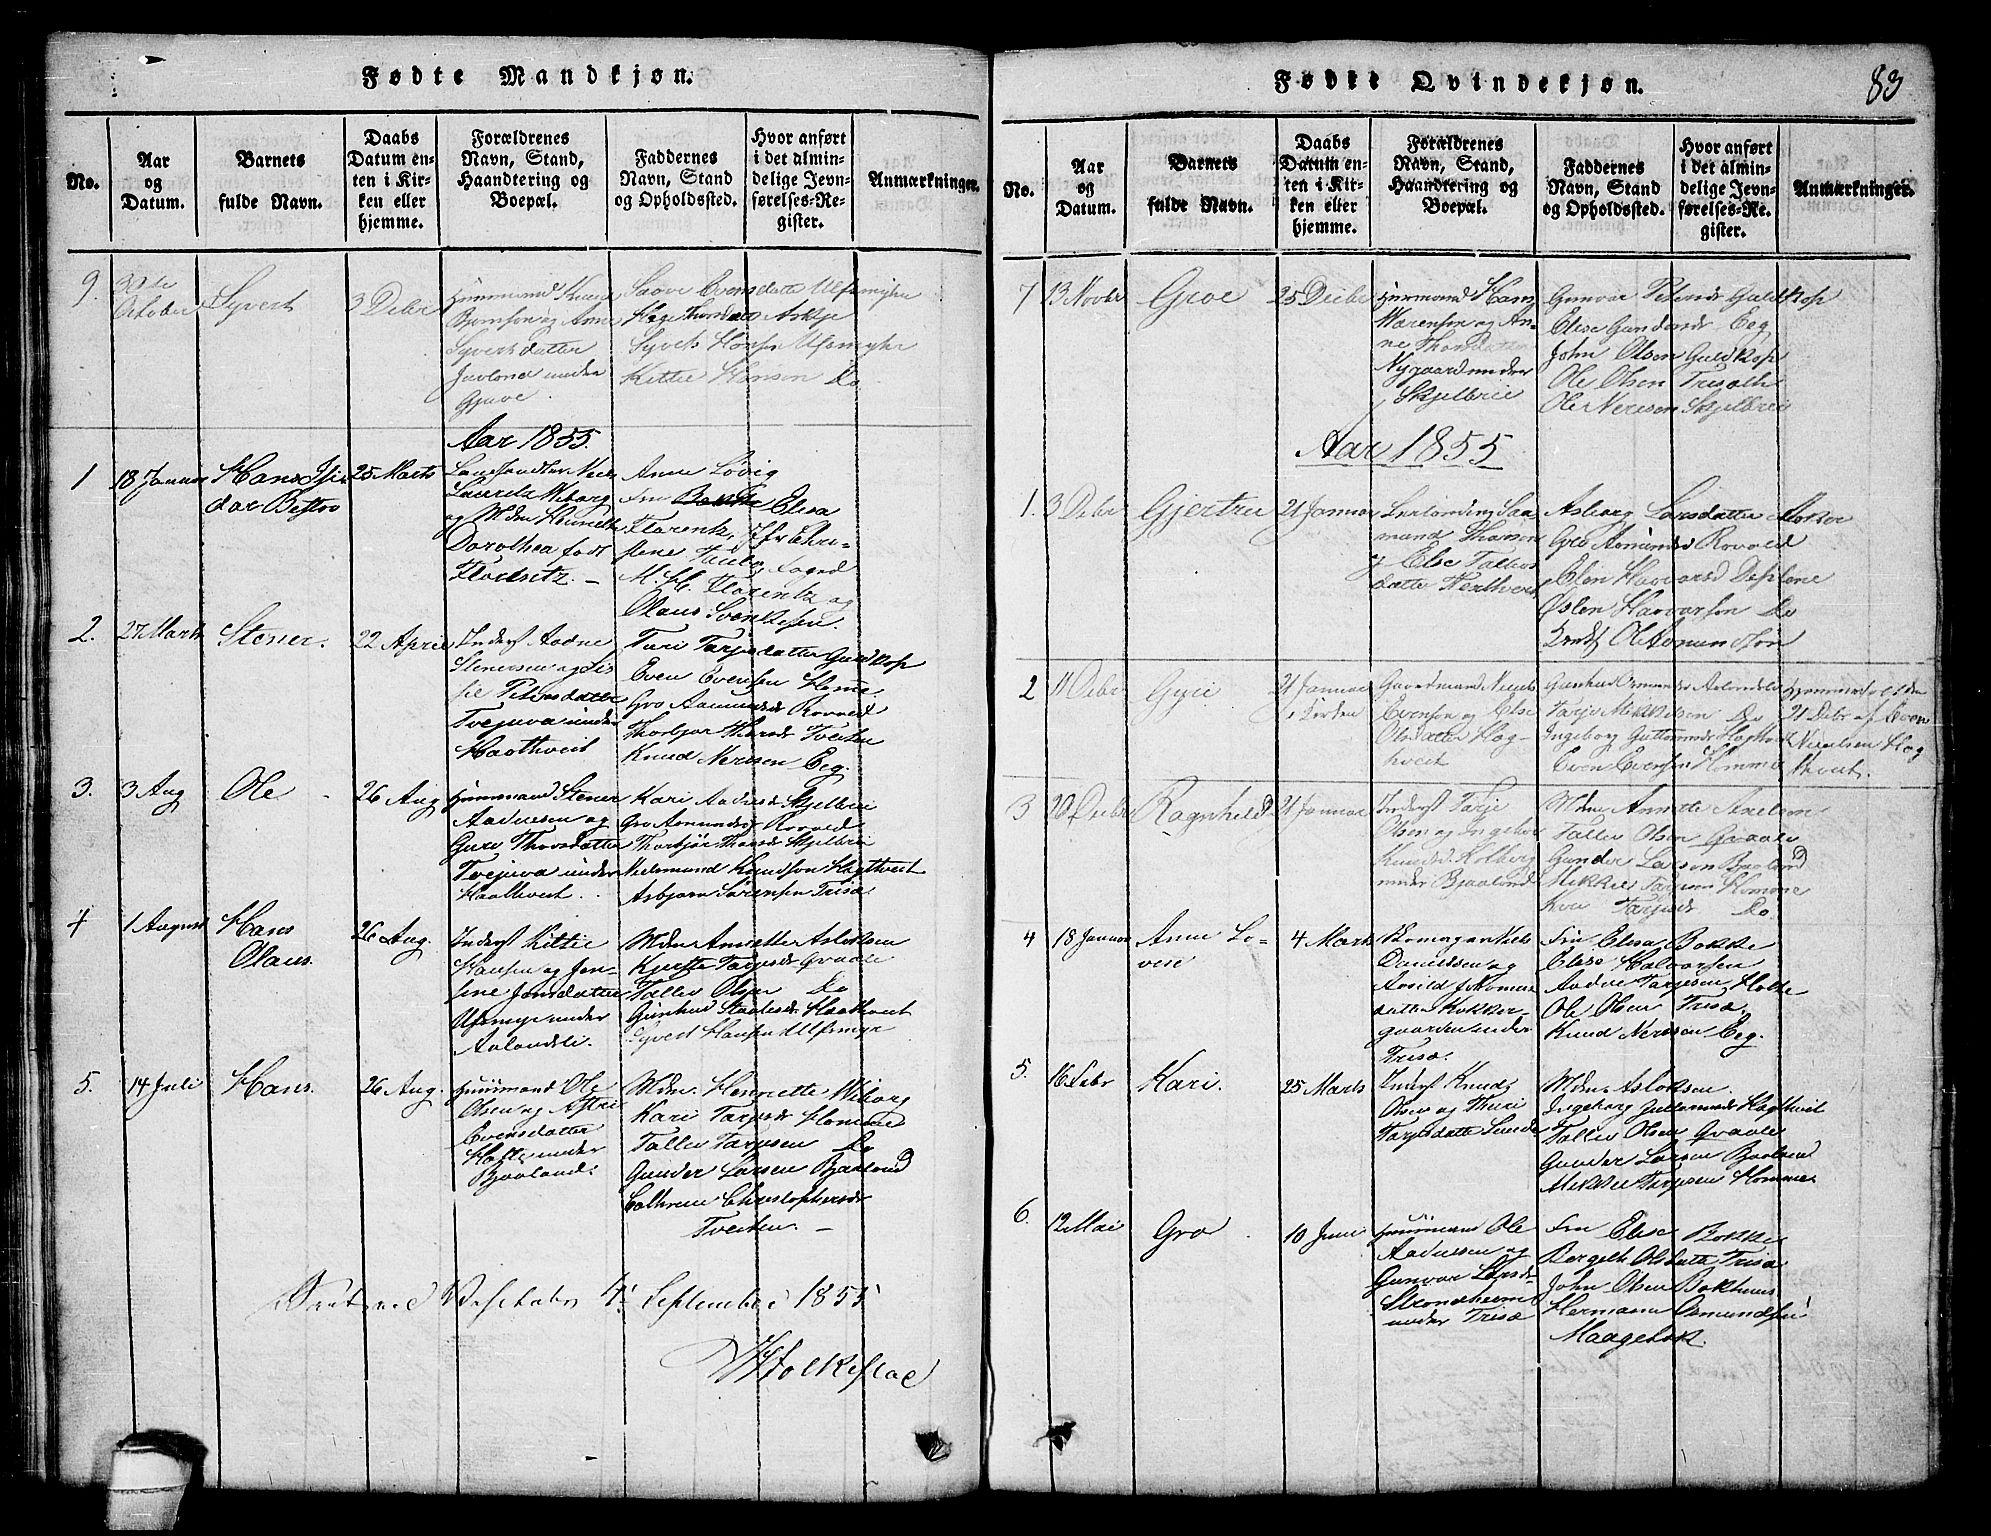 SAKO, Lårdal kirkebøker, G/Ga/L0001: Klokkerbok nr. I 1, 1815-1861, s. 83